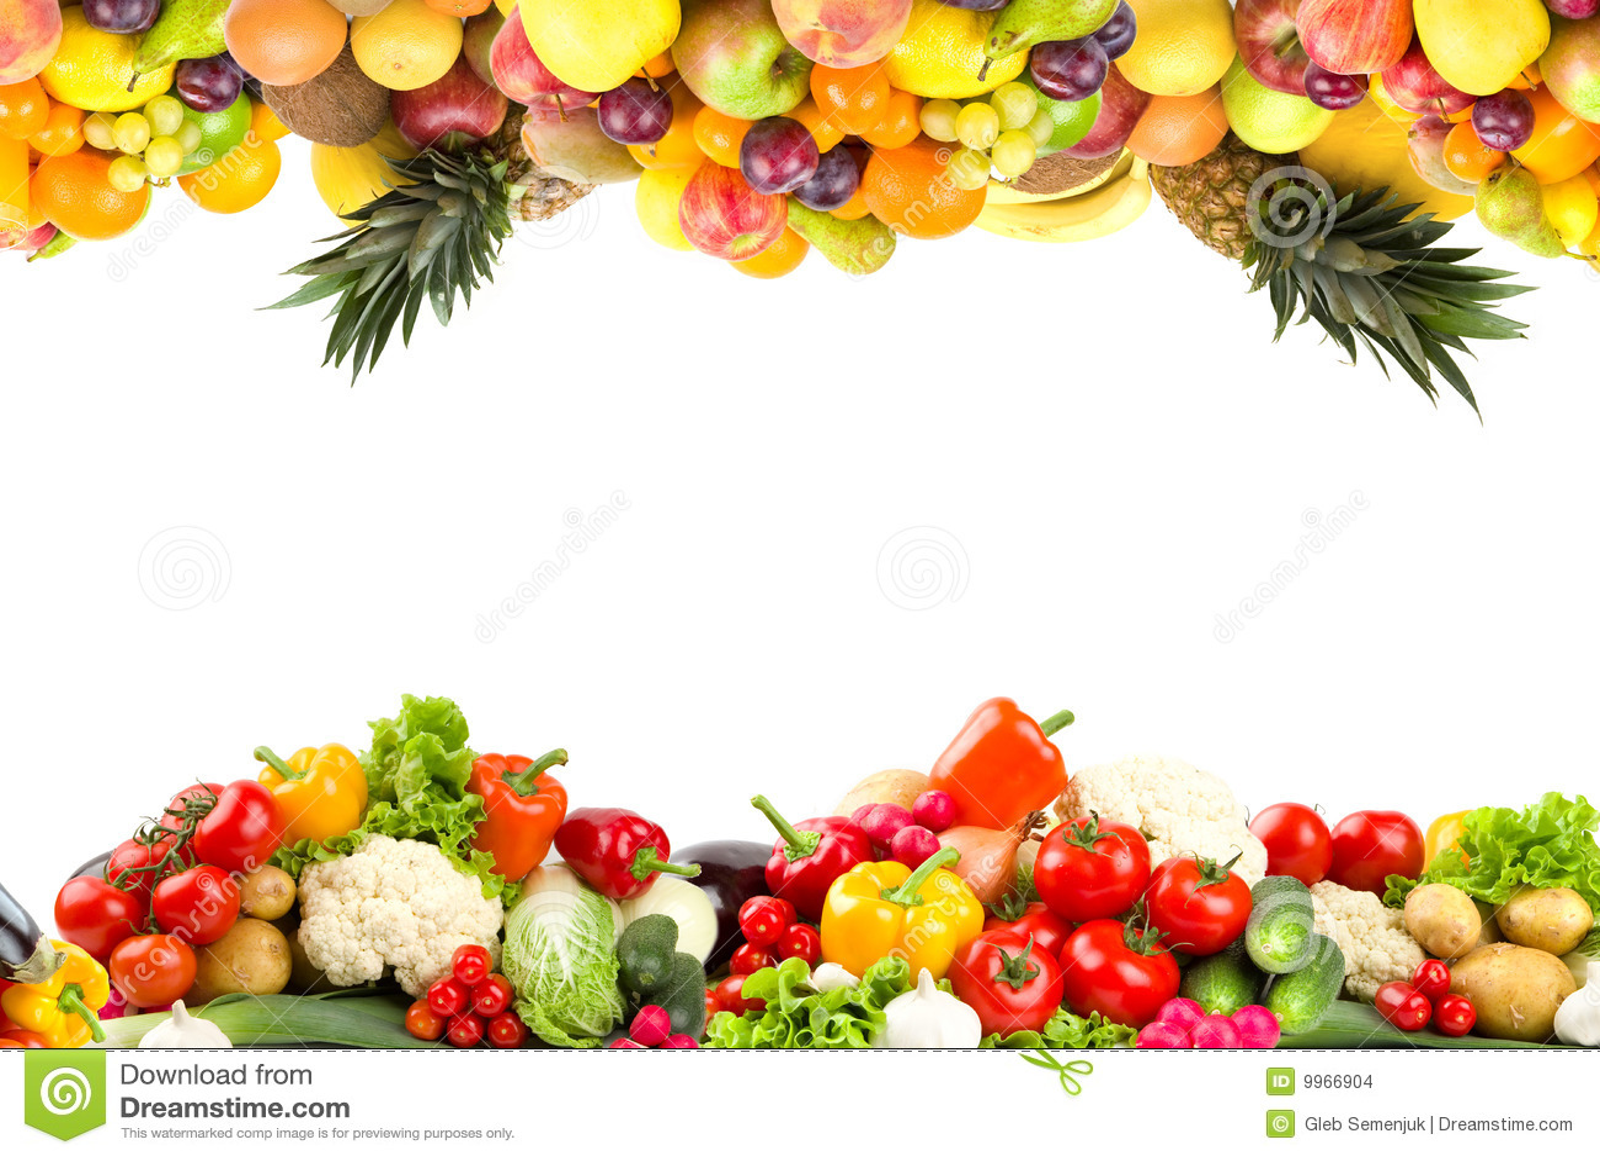 different vegetables sets stock images image 5874364